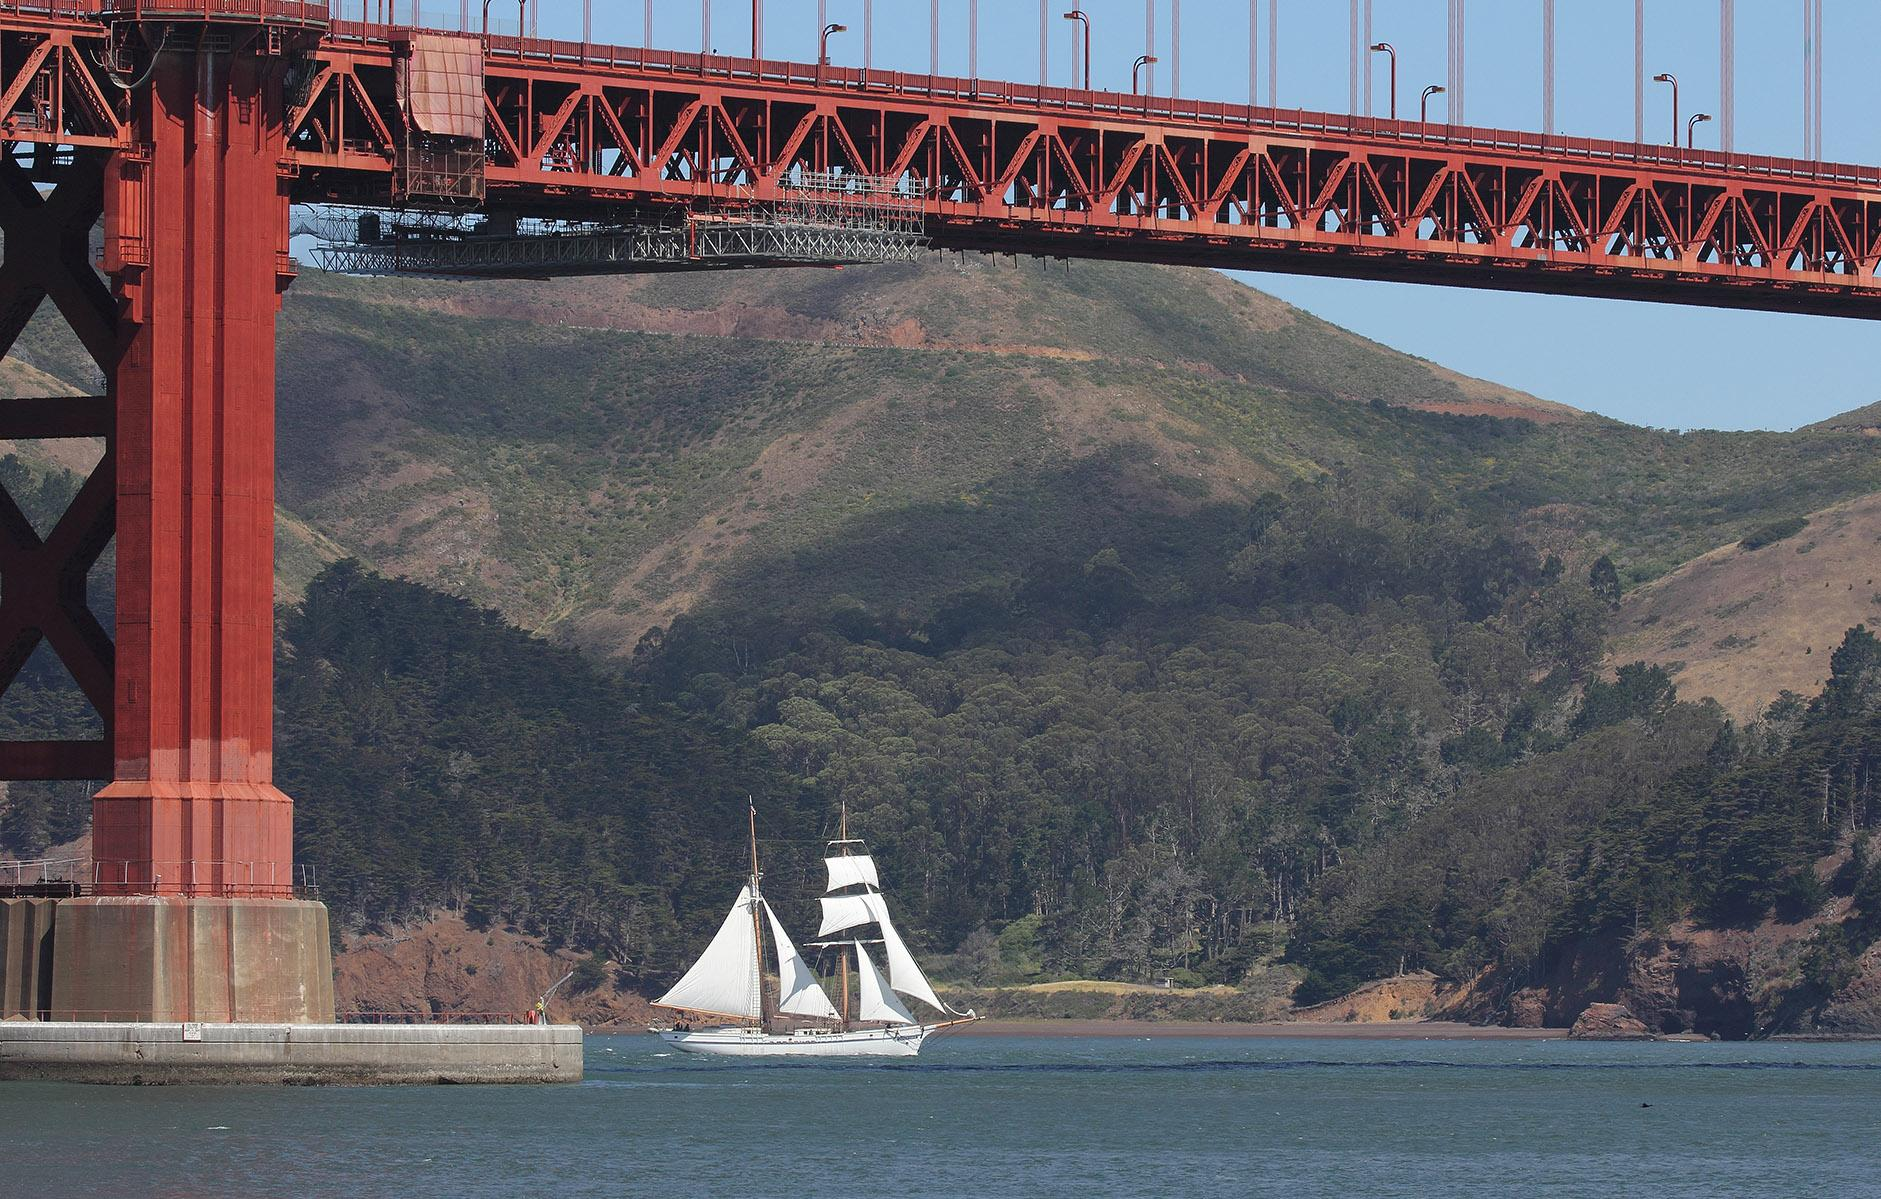 Matthew Turner sails beneath Golden Gate Bridge